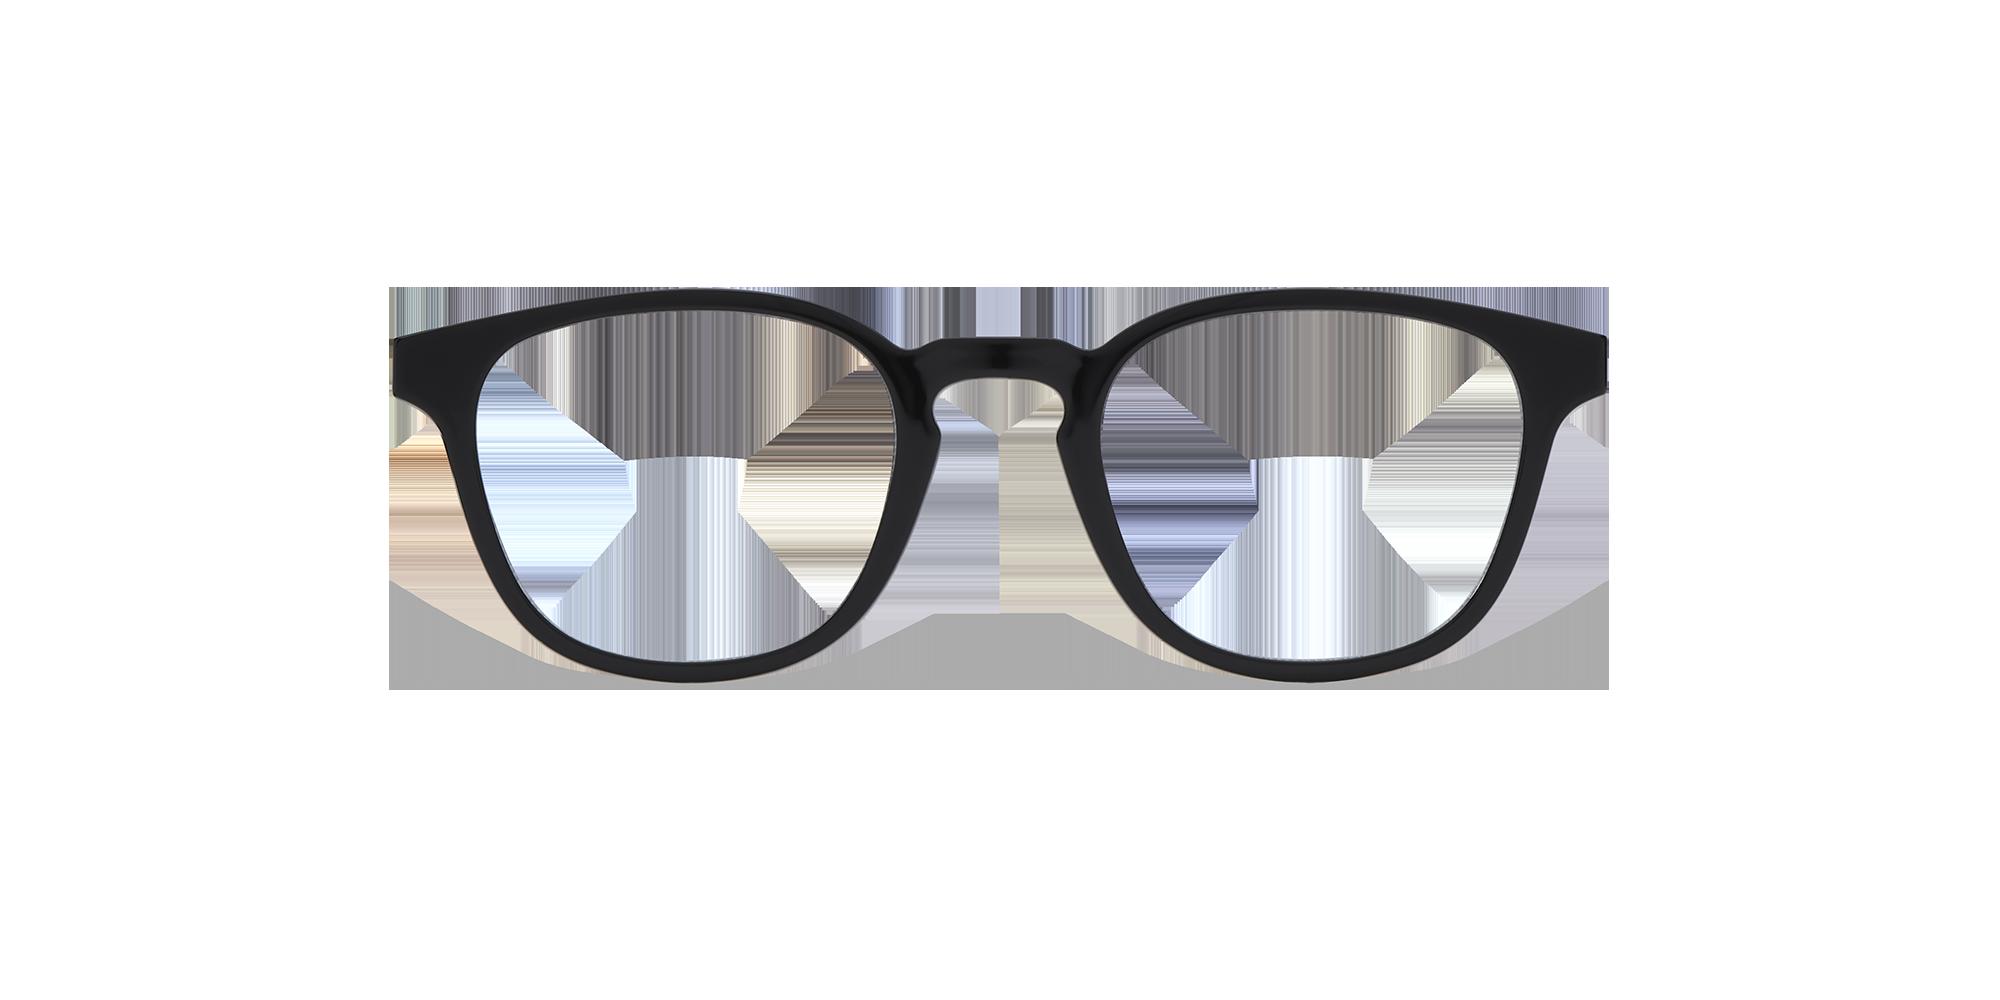 afflelou/france/products/smart_clip/clips_glasses/07630036429297_face.png